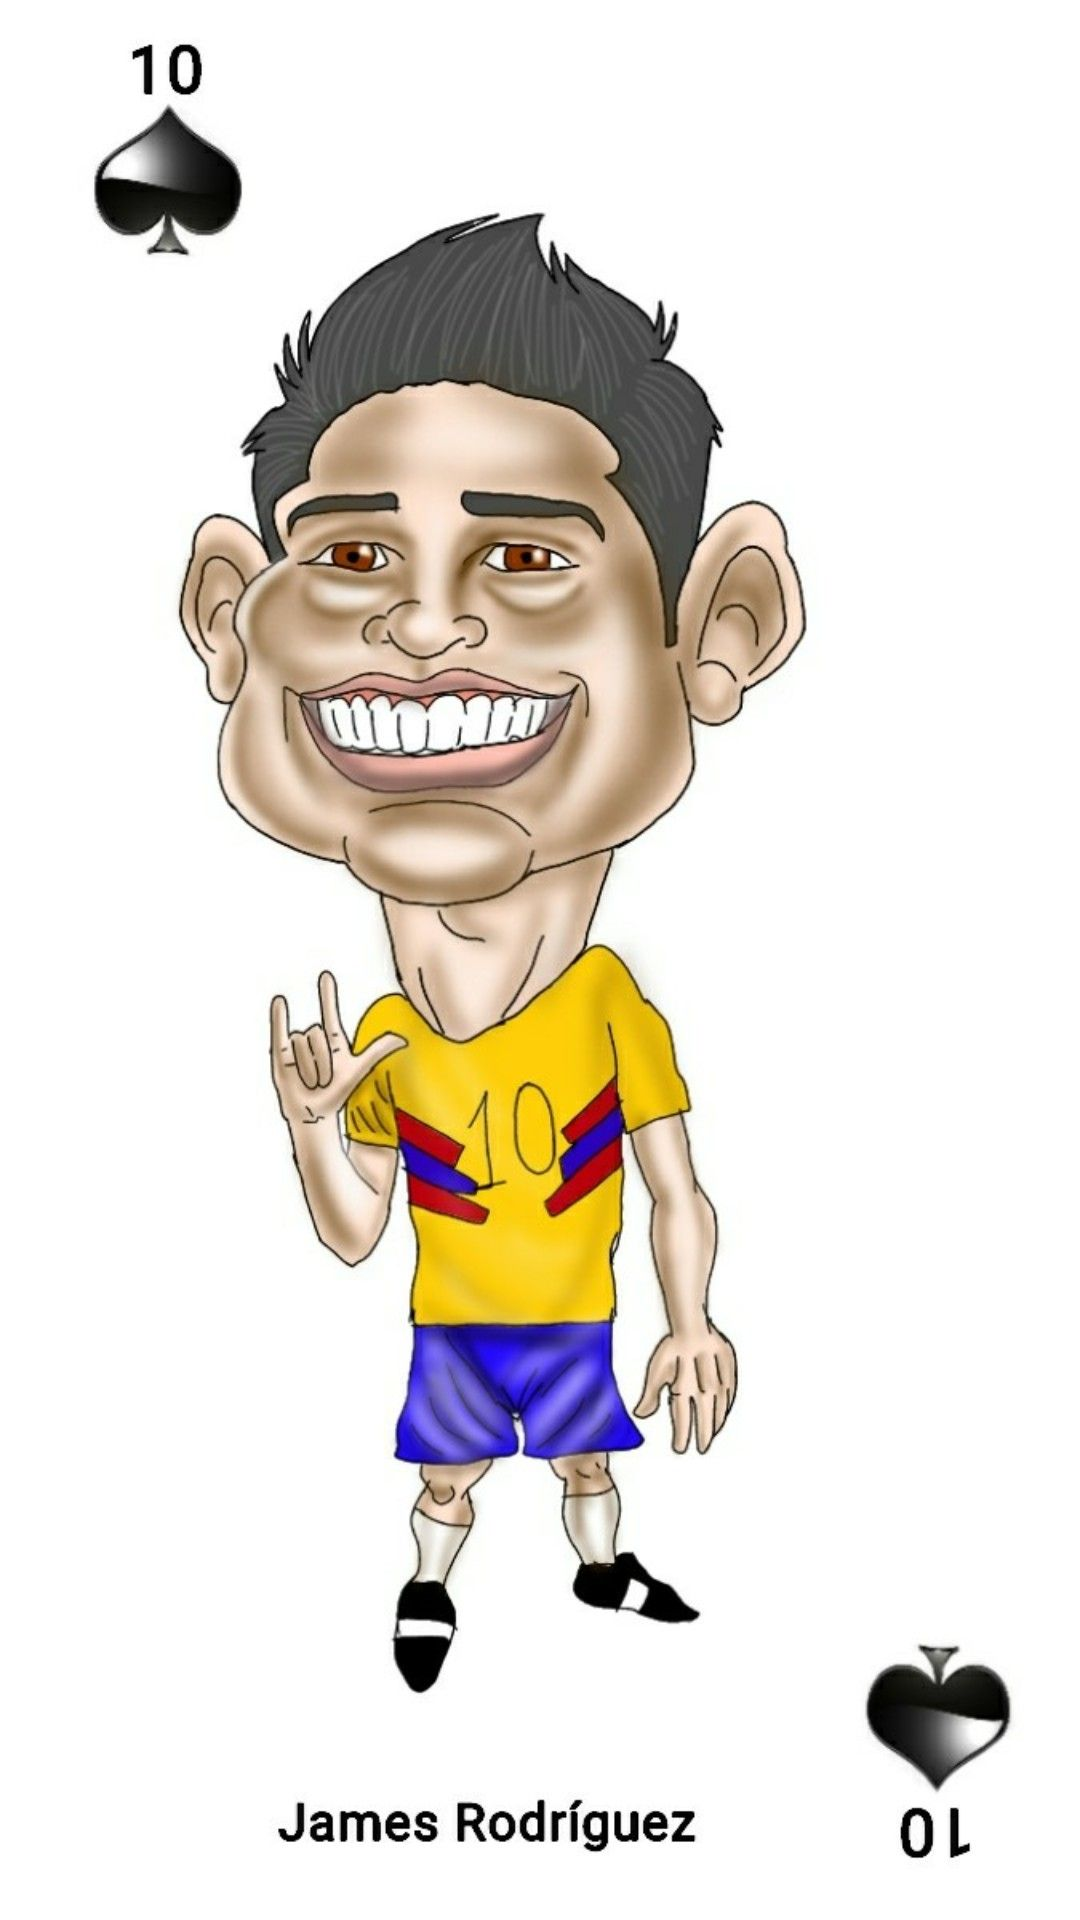 James Rodriguez Caricaturas James Rodriguez Caricaturas Fondo De Pantalla De Inicio